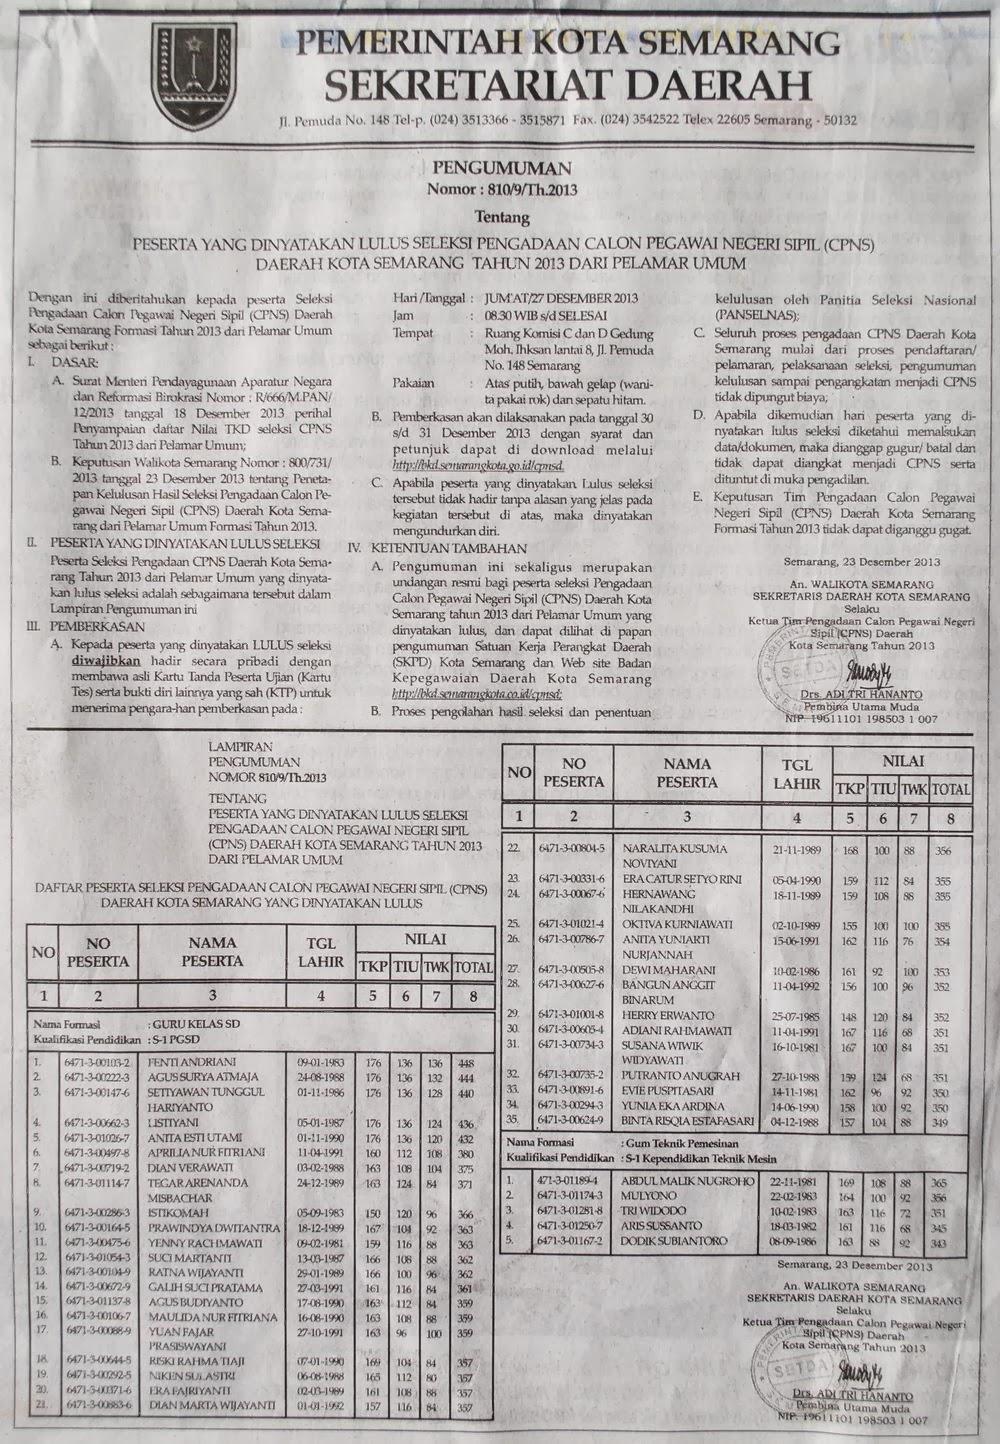 Info Pendaftaran Cpns Malang Info Cpns 2013 Pemkot Malang Agustus 2016 Terbaru Info Kab Sumbawa Barat Mirror Kab Pasaman Kab Bantaeng Kota Malang